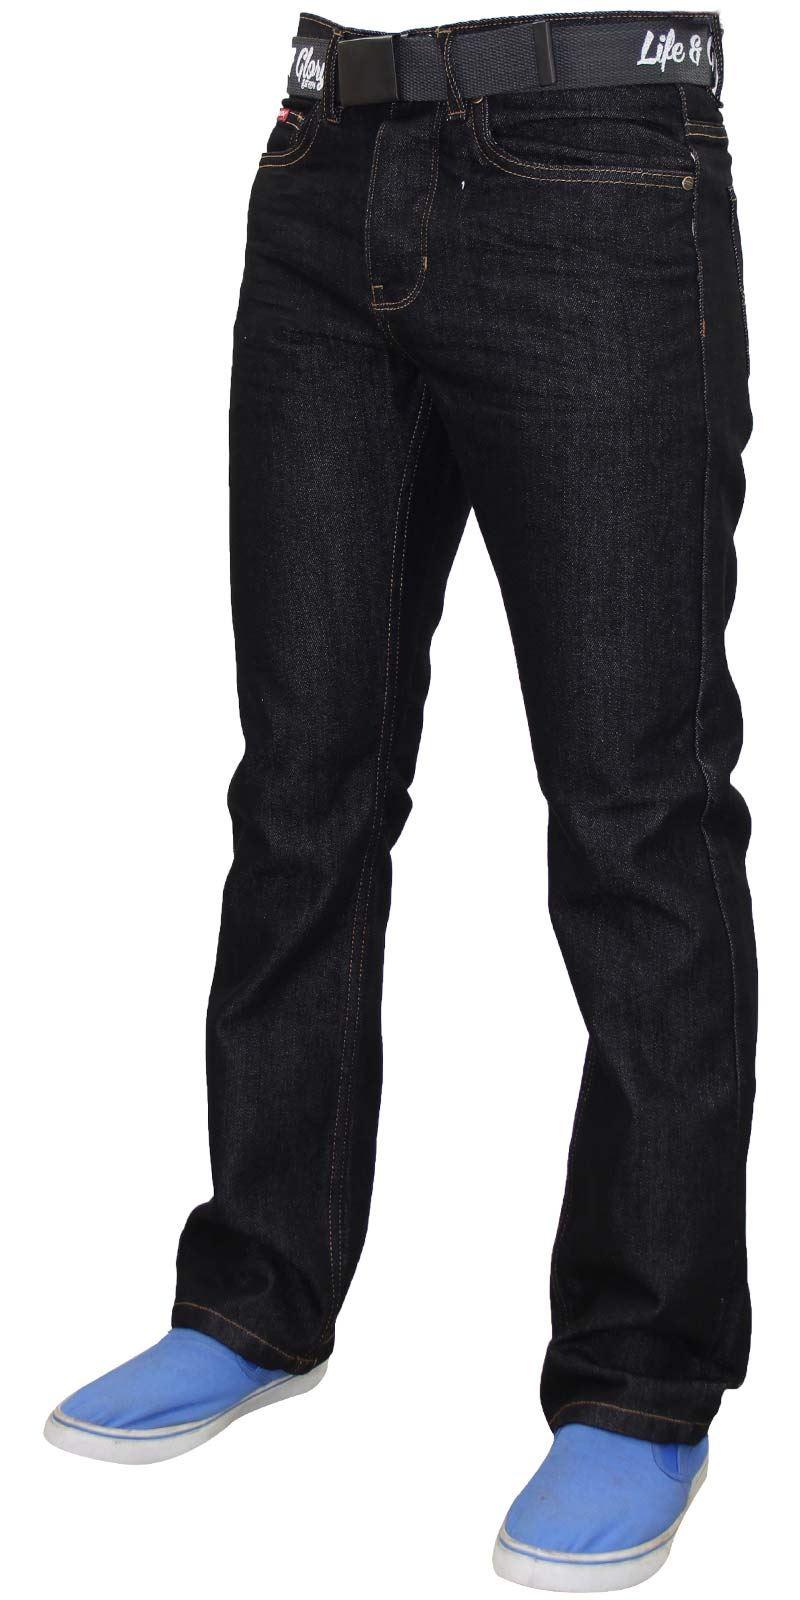 Men-Regular-Fit-Jeans-Denim-Button-Fly-Straight-Leg-Trouser-Pant-With-Free-Belt thumbnail 4